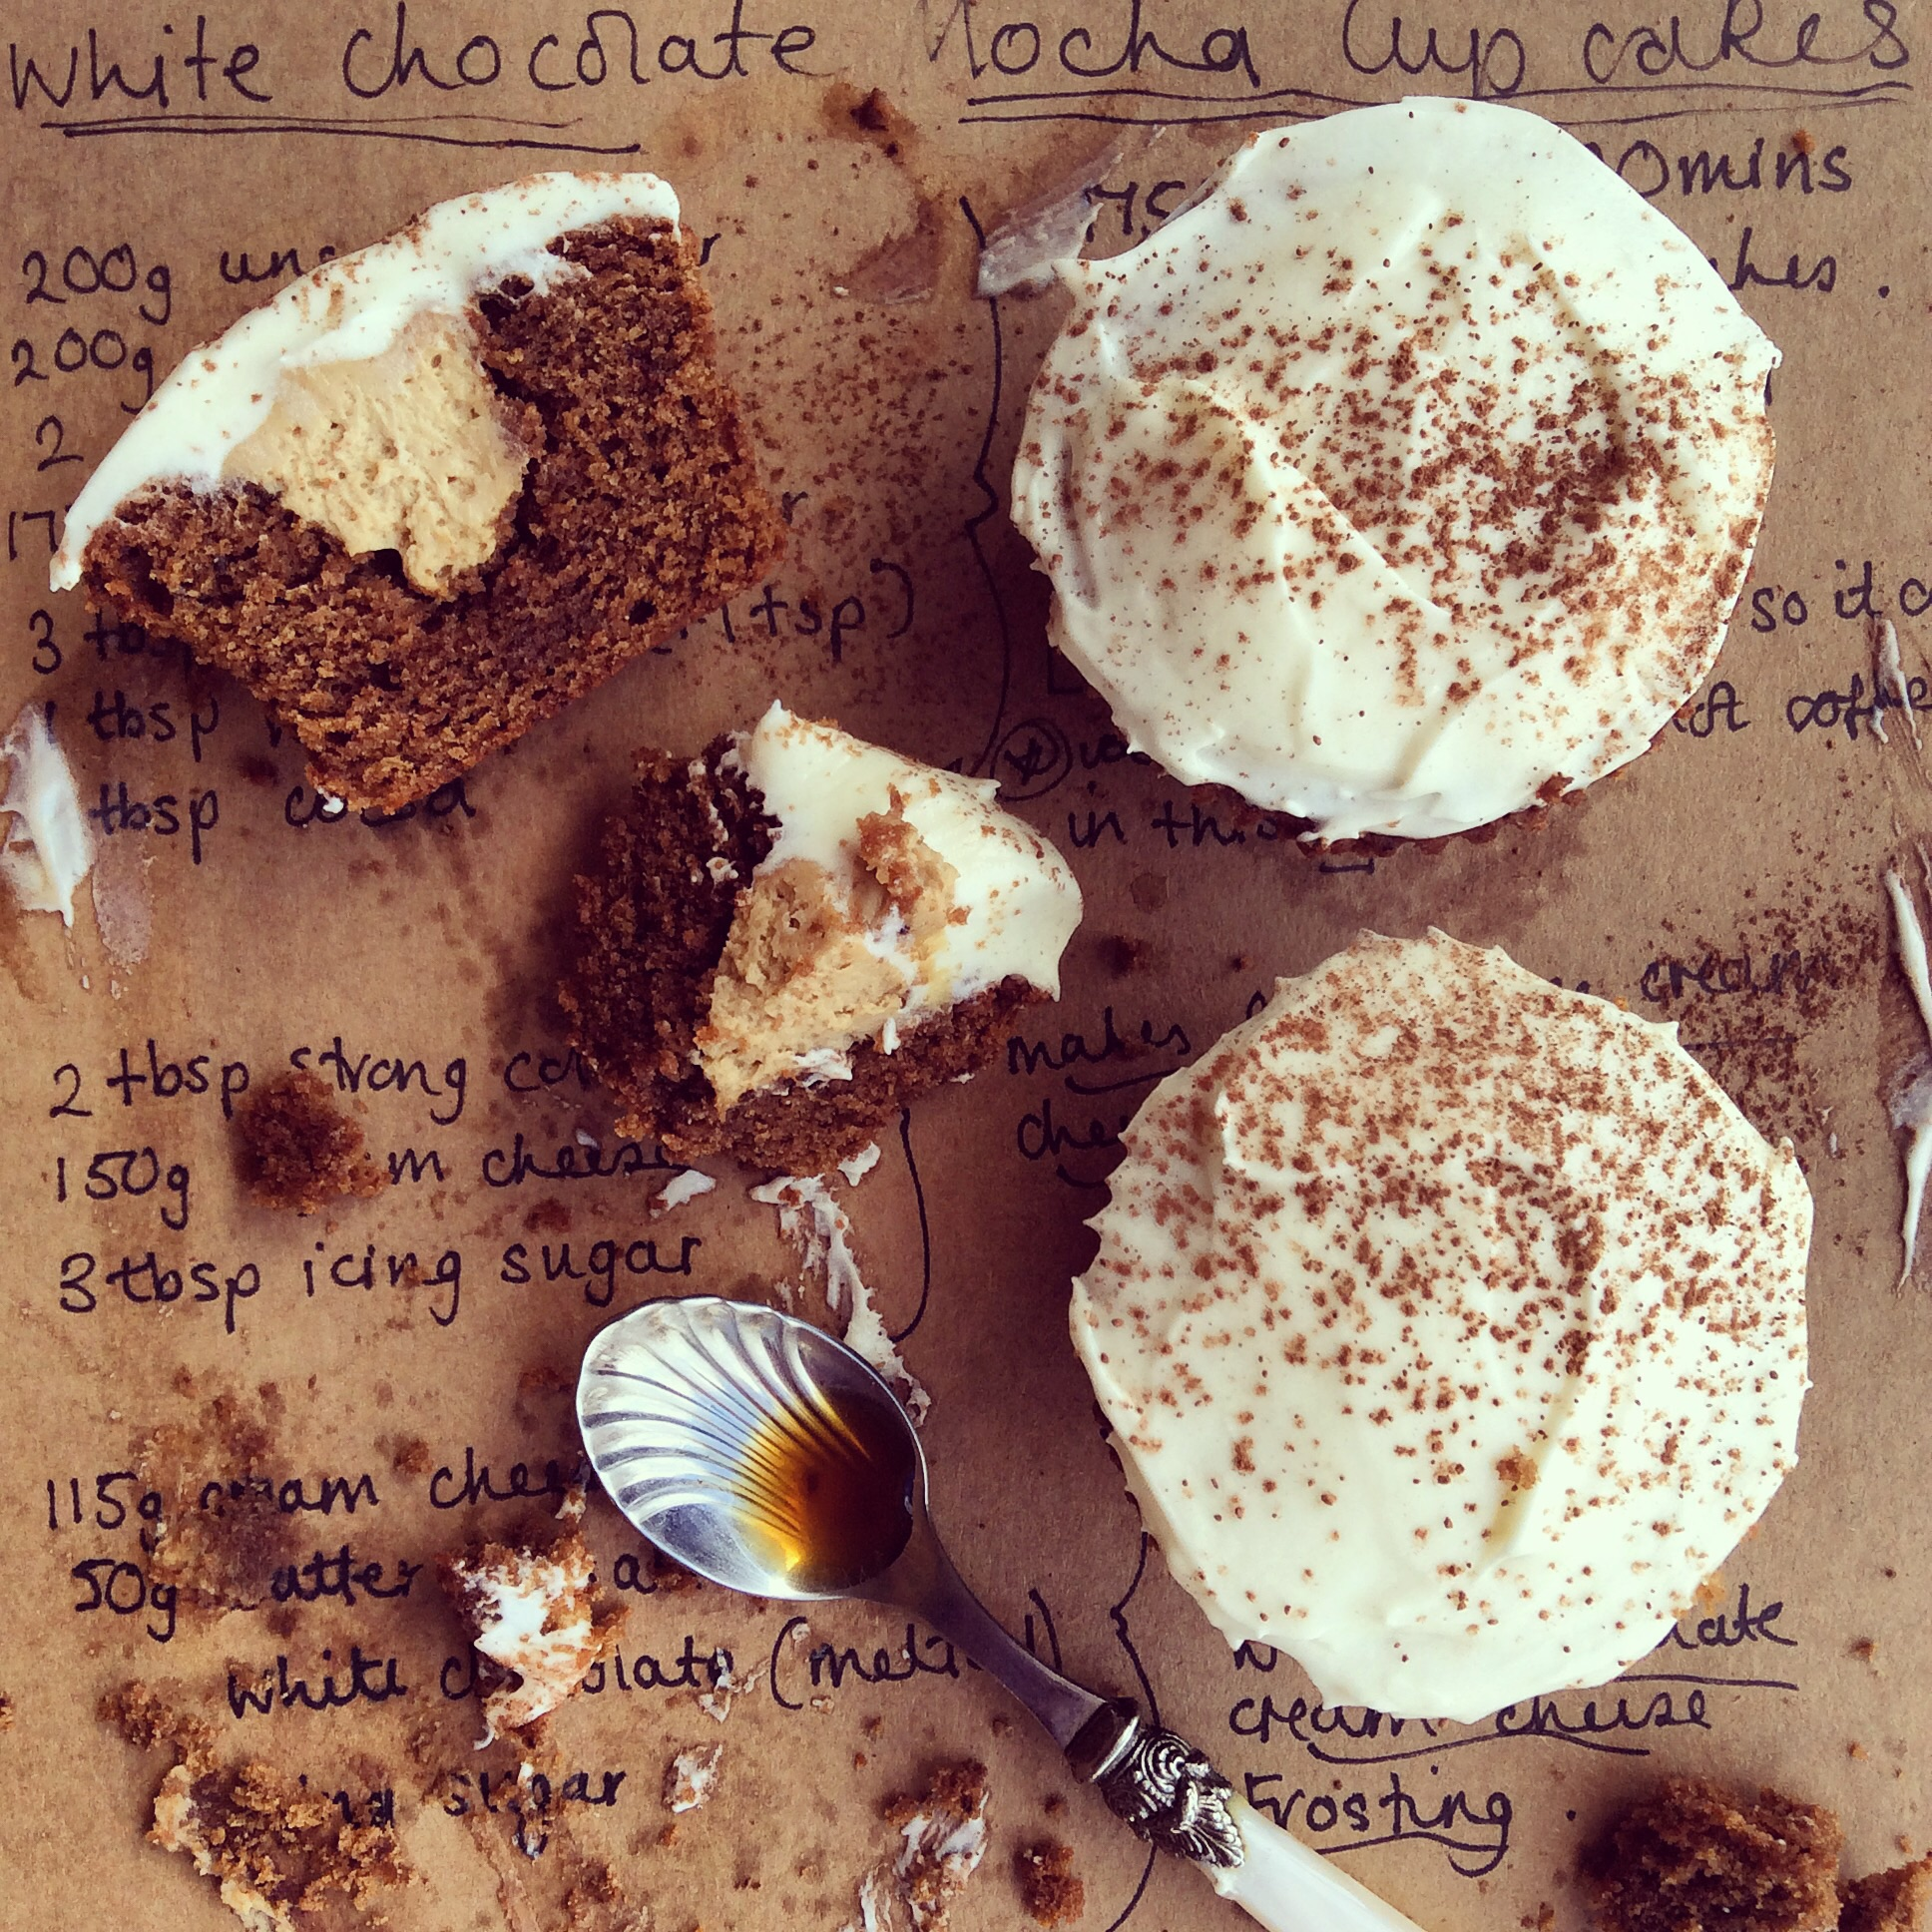 Mocha Cupcakes - Stuffed with Coffee Cream